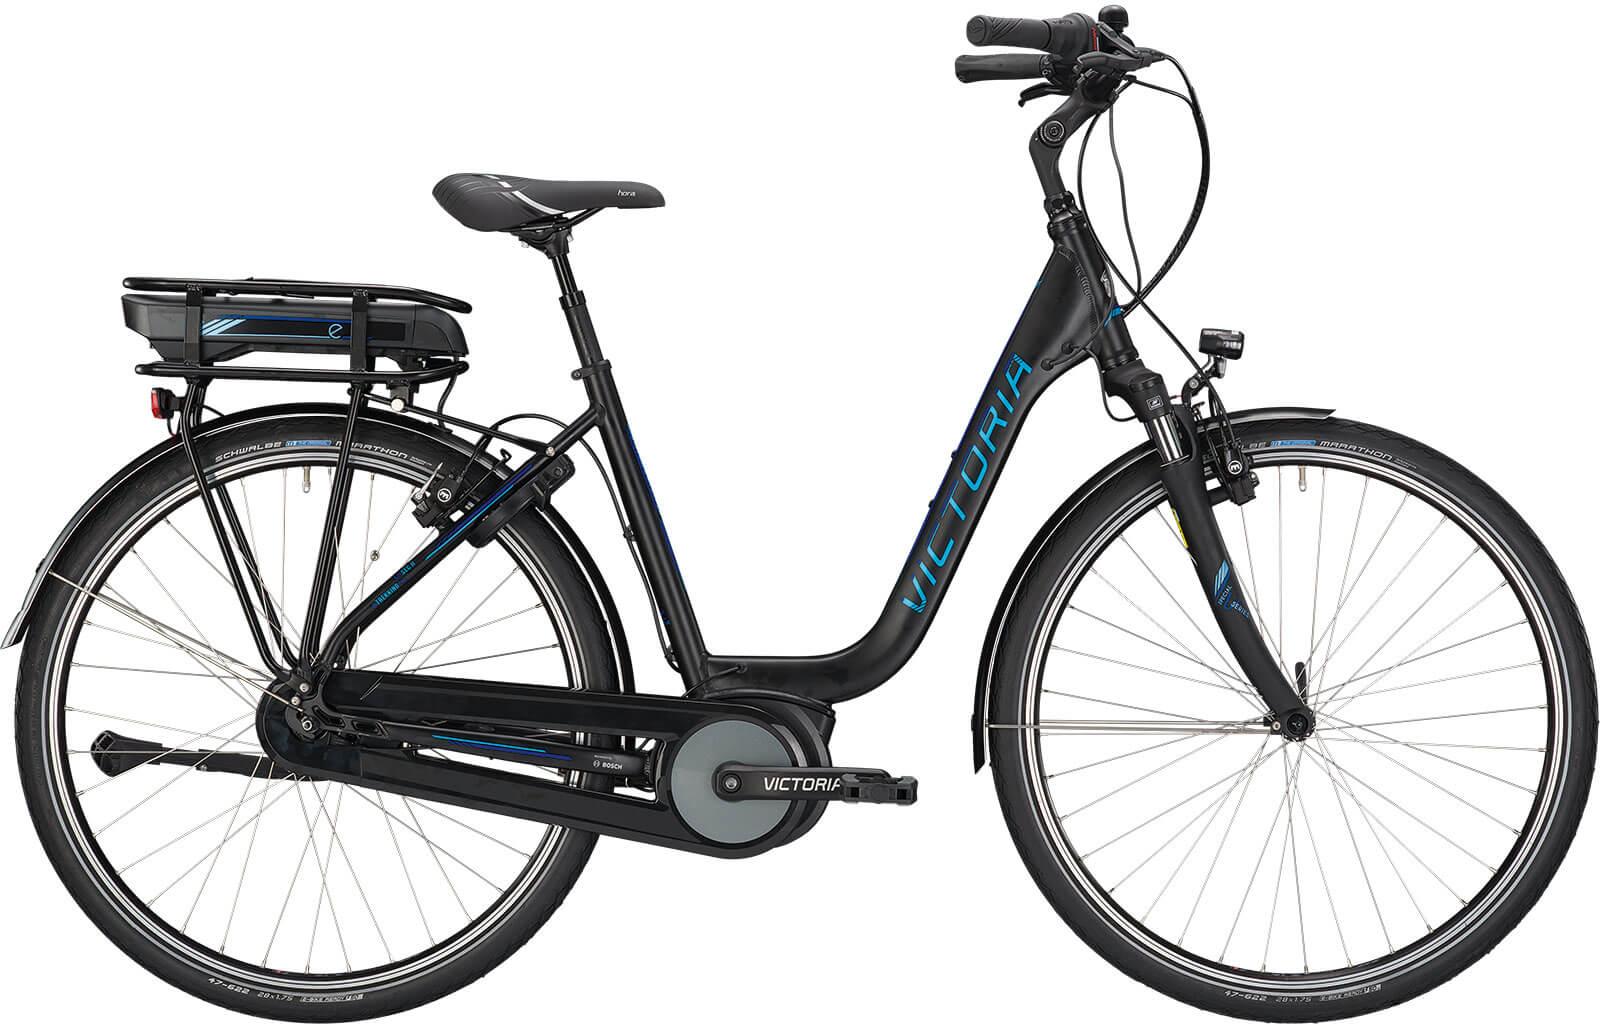 victoria e bike 5 7 seh bosch motor 400 watt accu modelj 19 delta bikes. Black Bedroom Furniture Sets. Home Design Ideas